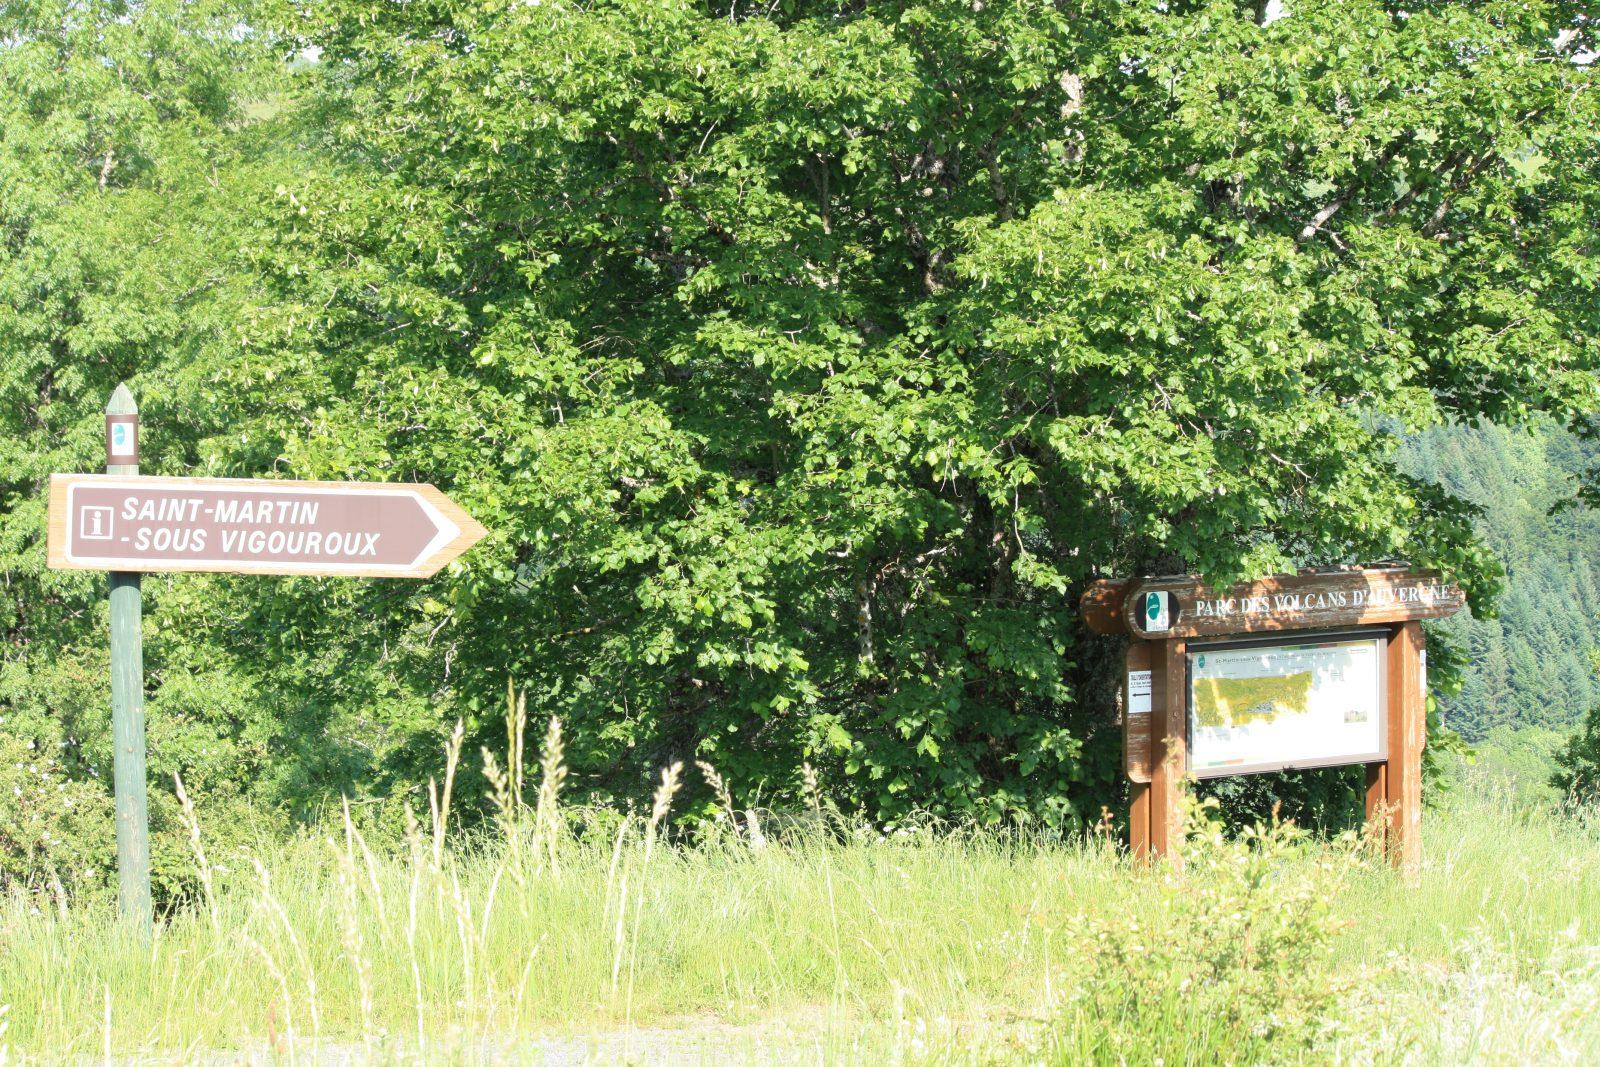 Site of Saint-Martin-4